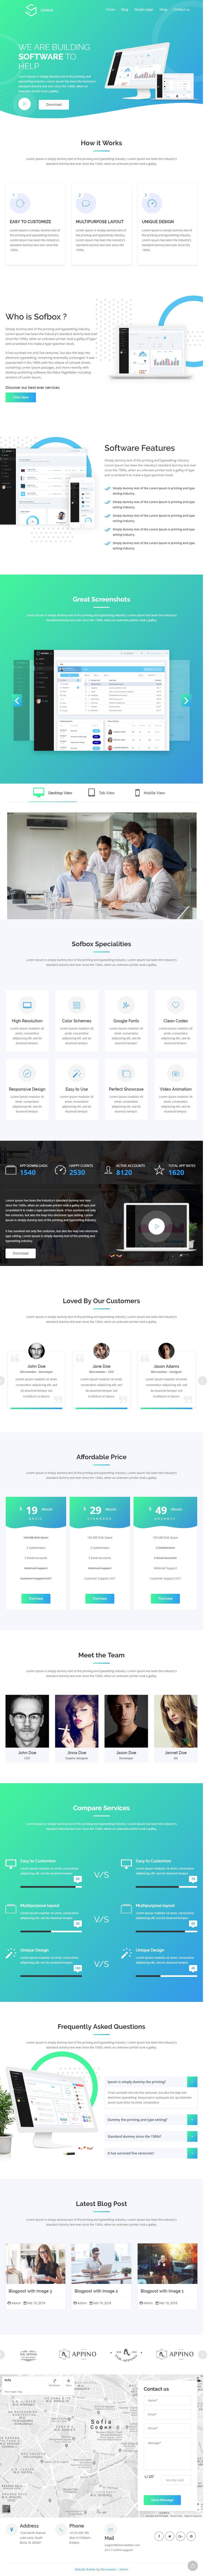 Sofbox Microweber Free Web Design Free Website Hosting Web Hosting